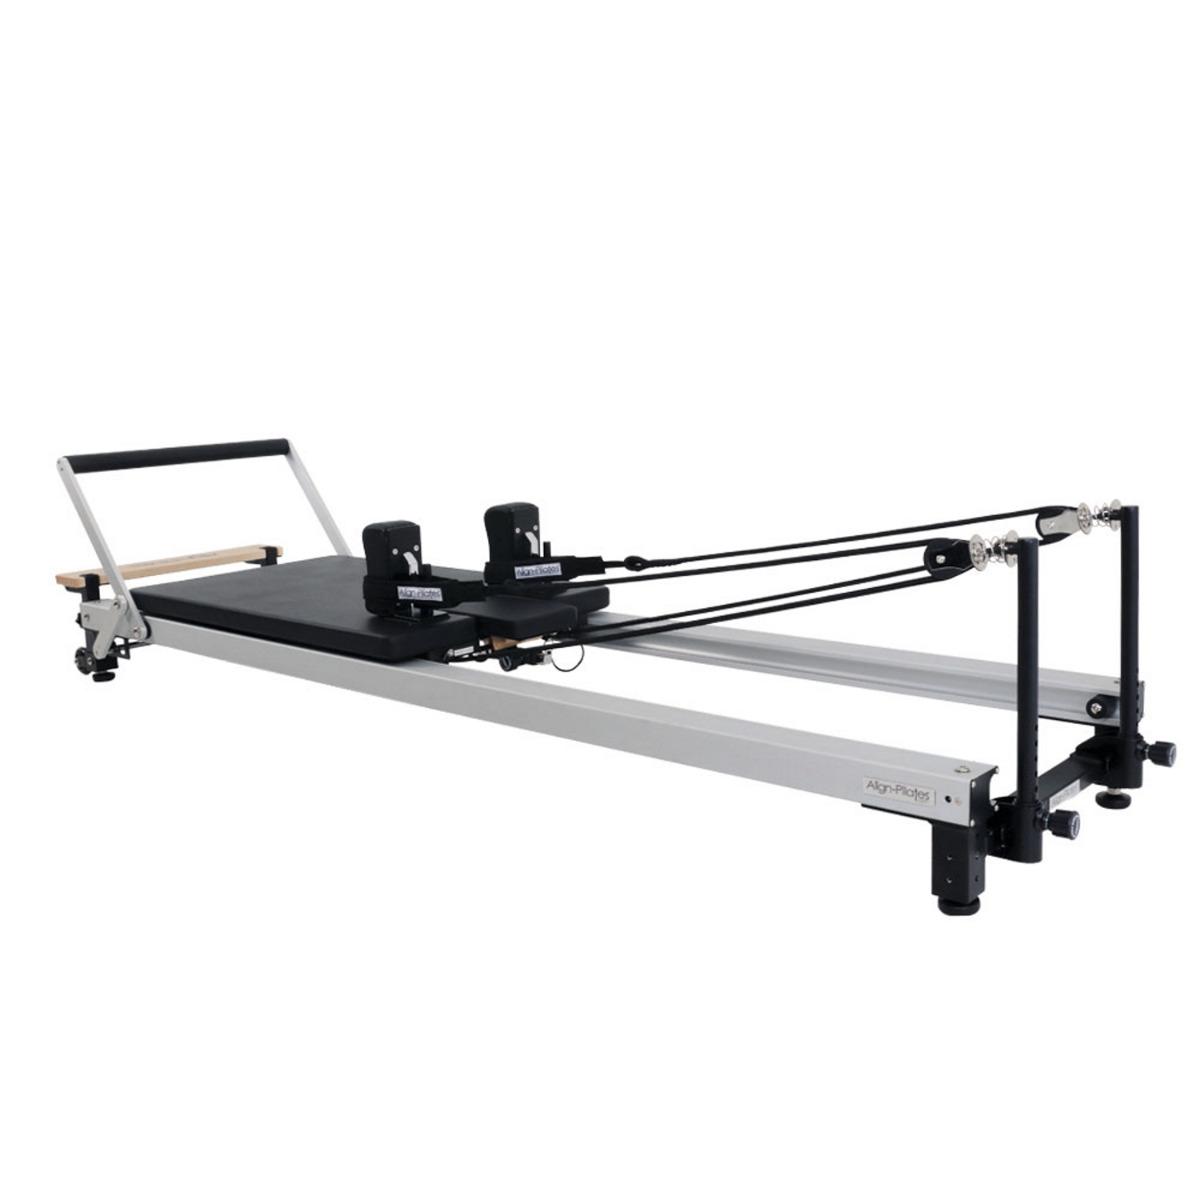 Align-Pilates C2-Pro Reformer